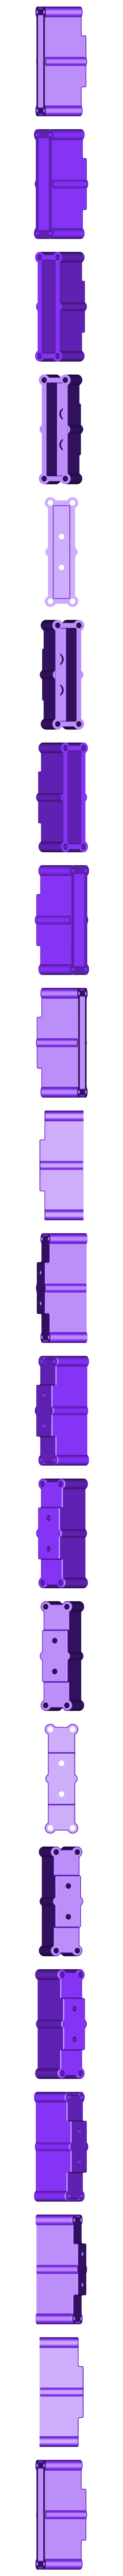 GIE KRAFT A002 002 Support camera.stl Download free STL file 5.8GHz Transmitter Holder with Miniature Camera • 3D printable object, JJB